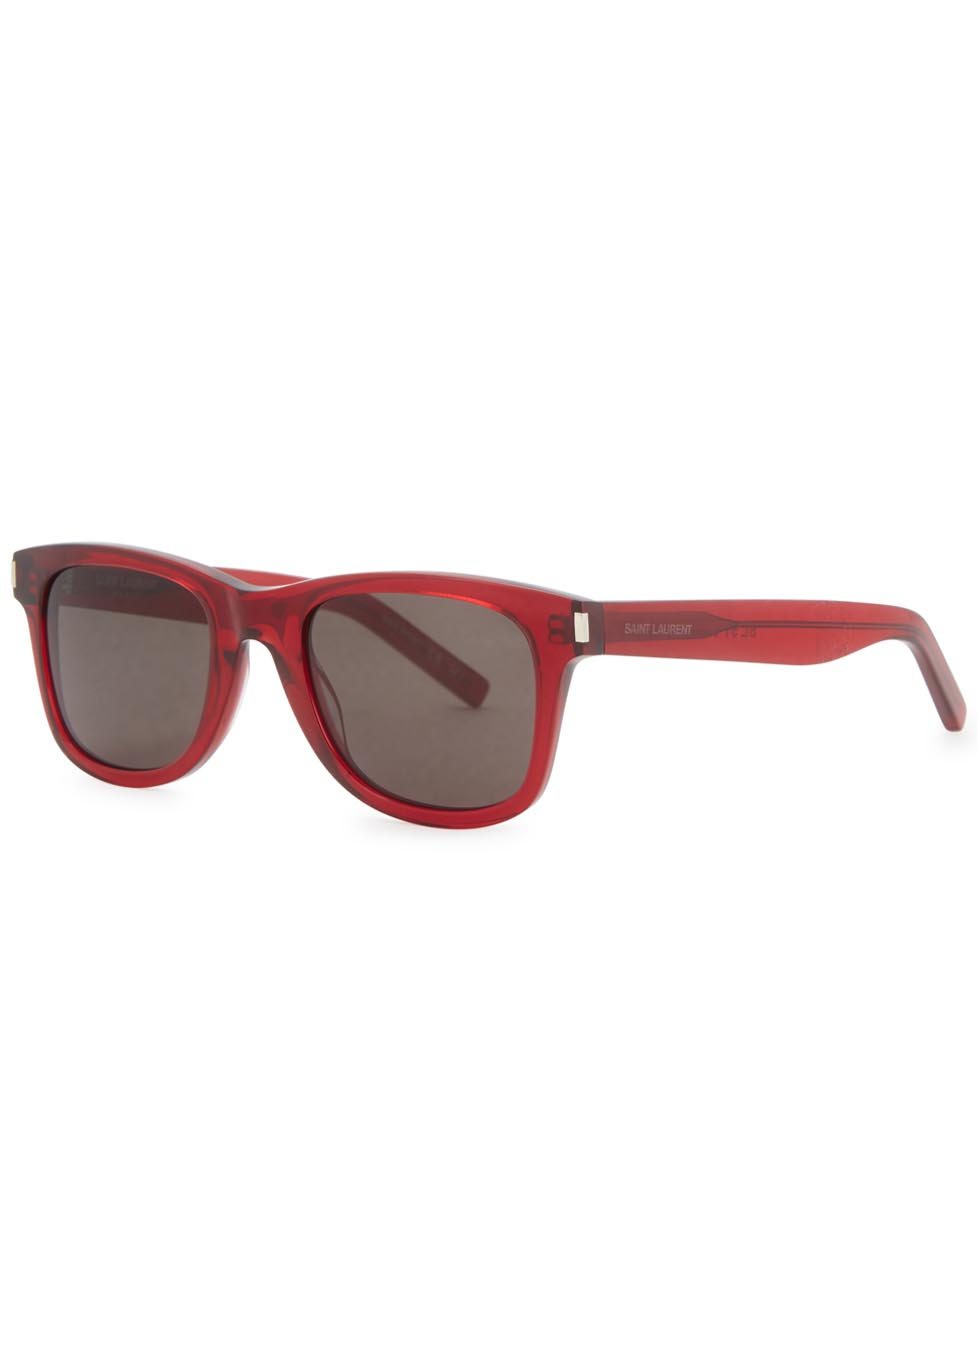 SL 51 red square-frame sunglasses - Saint Laurent